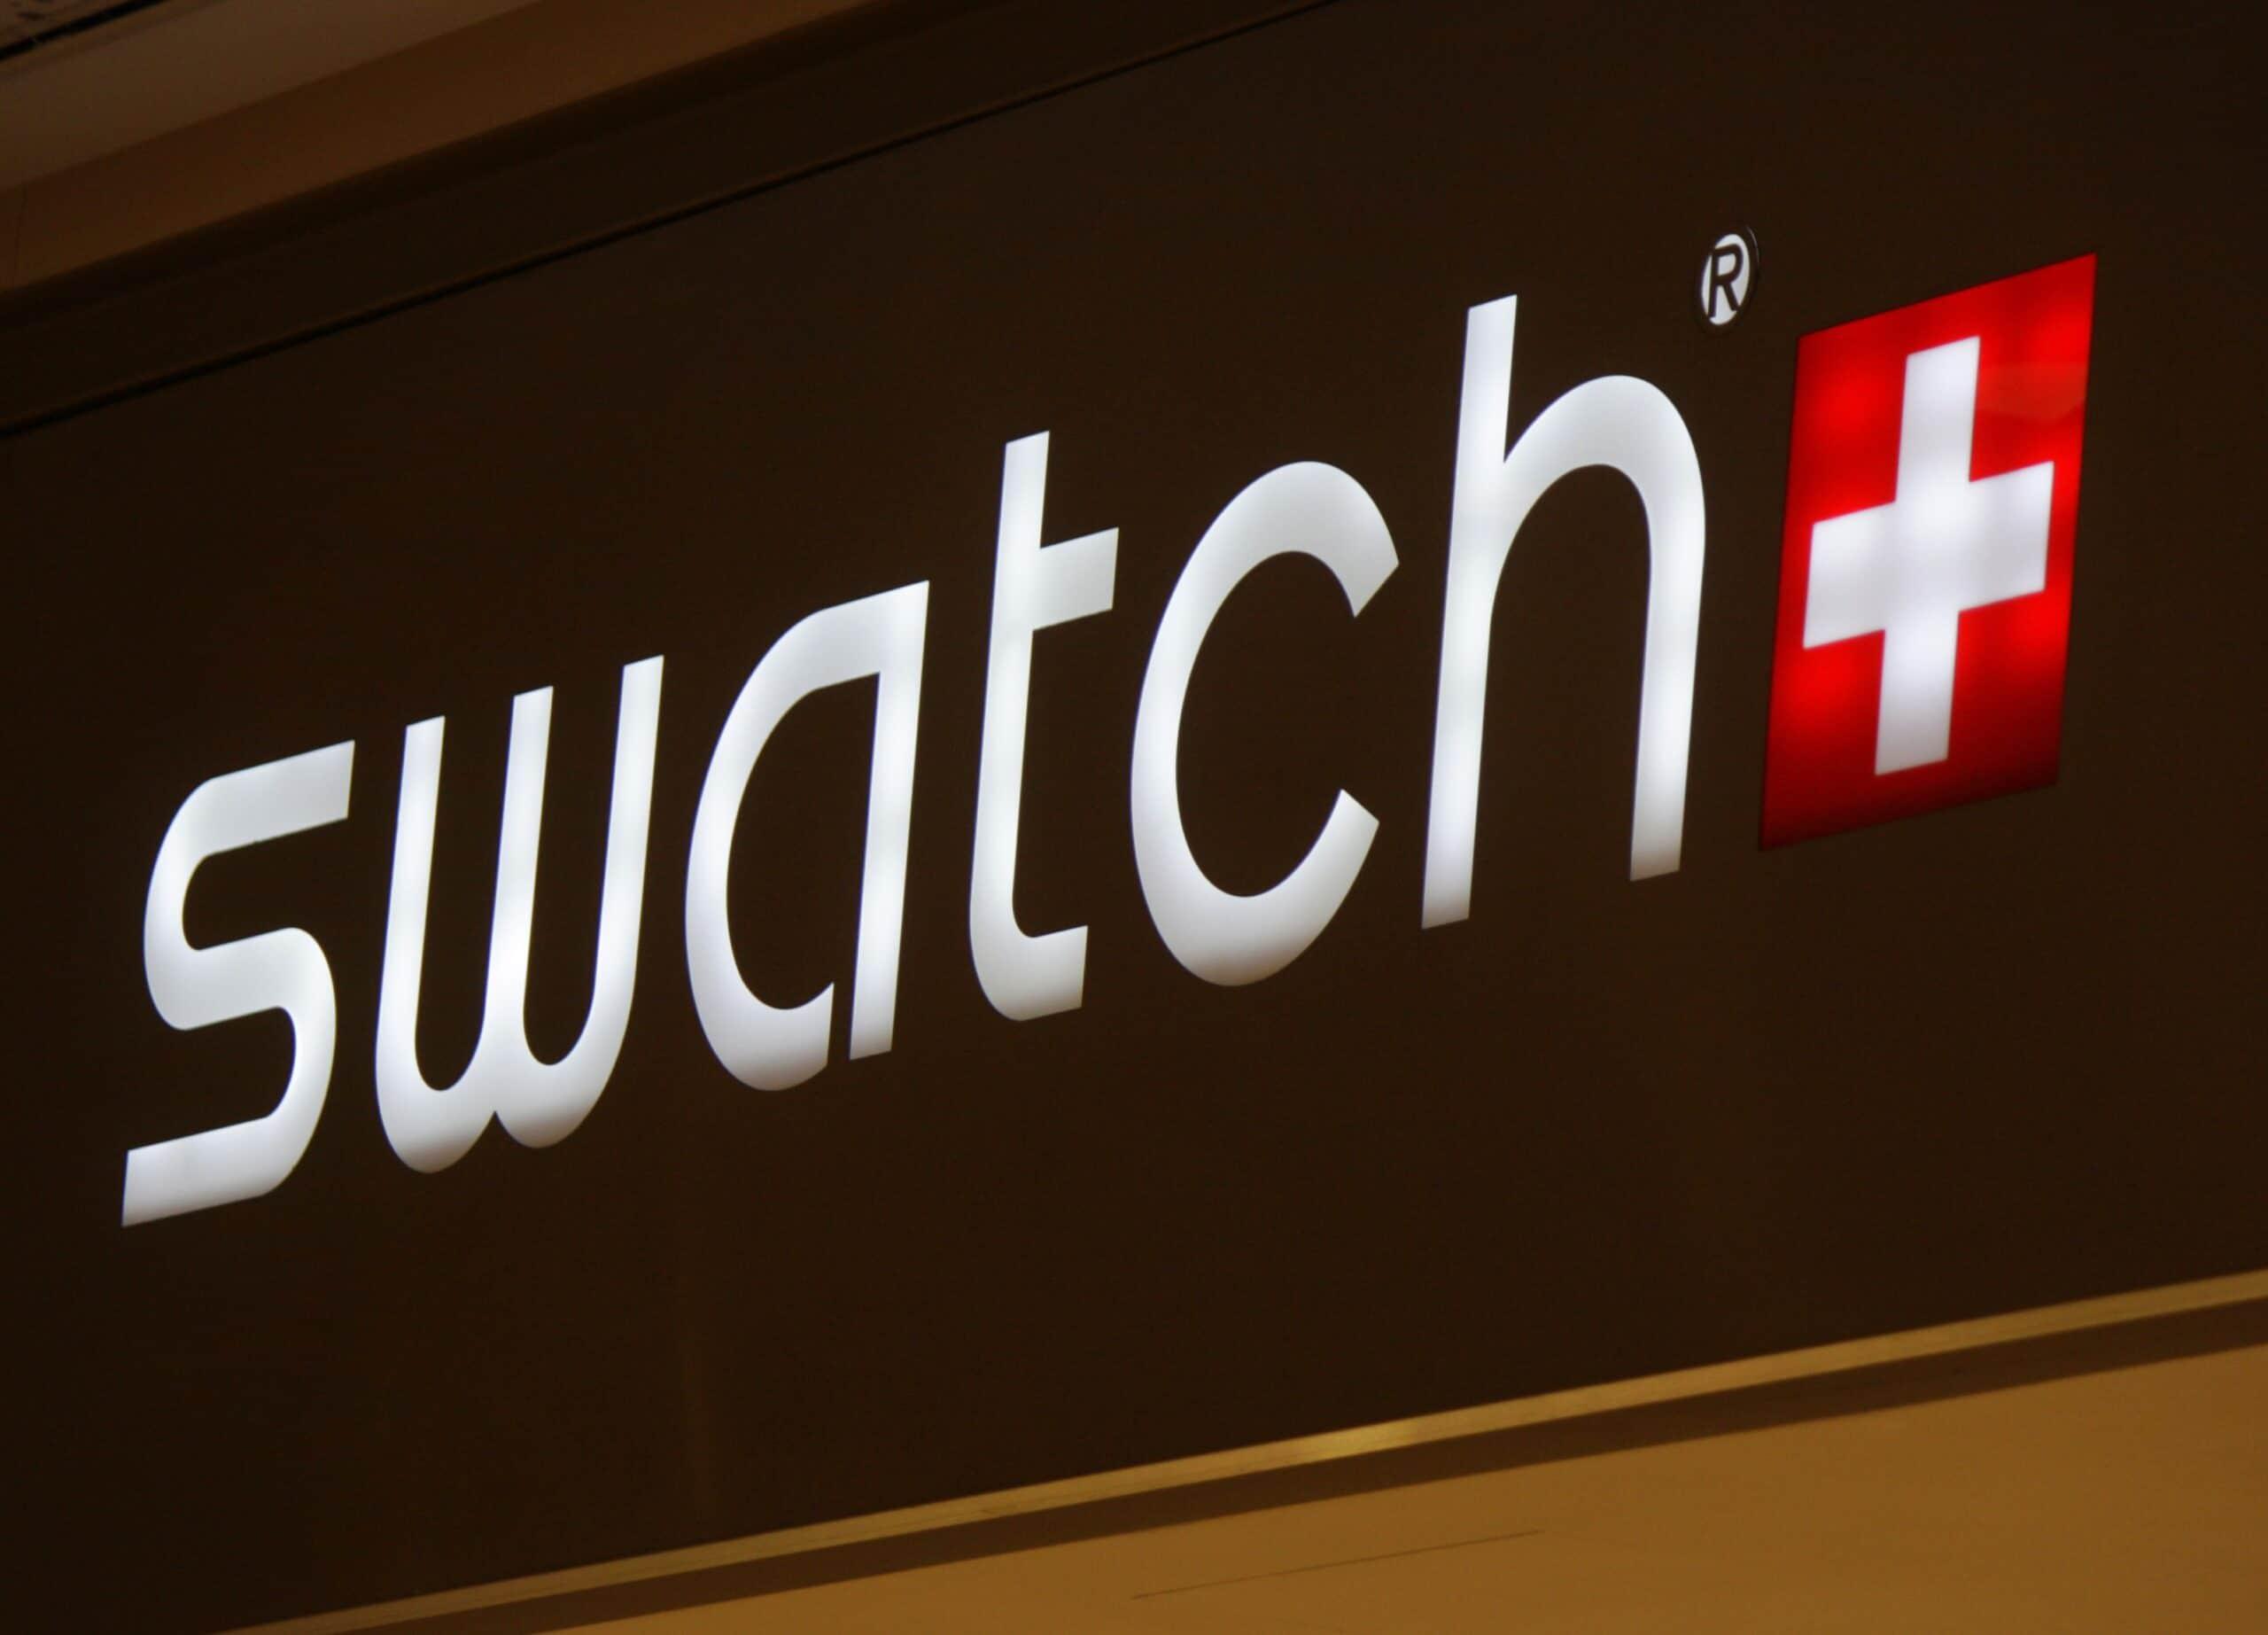 Marca da Swatch